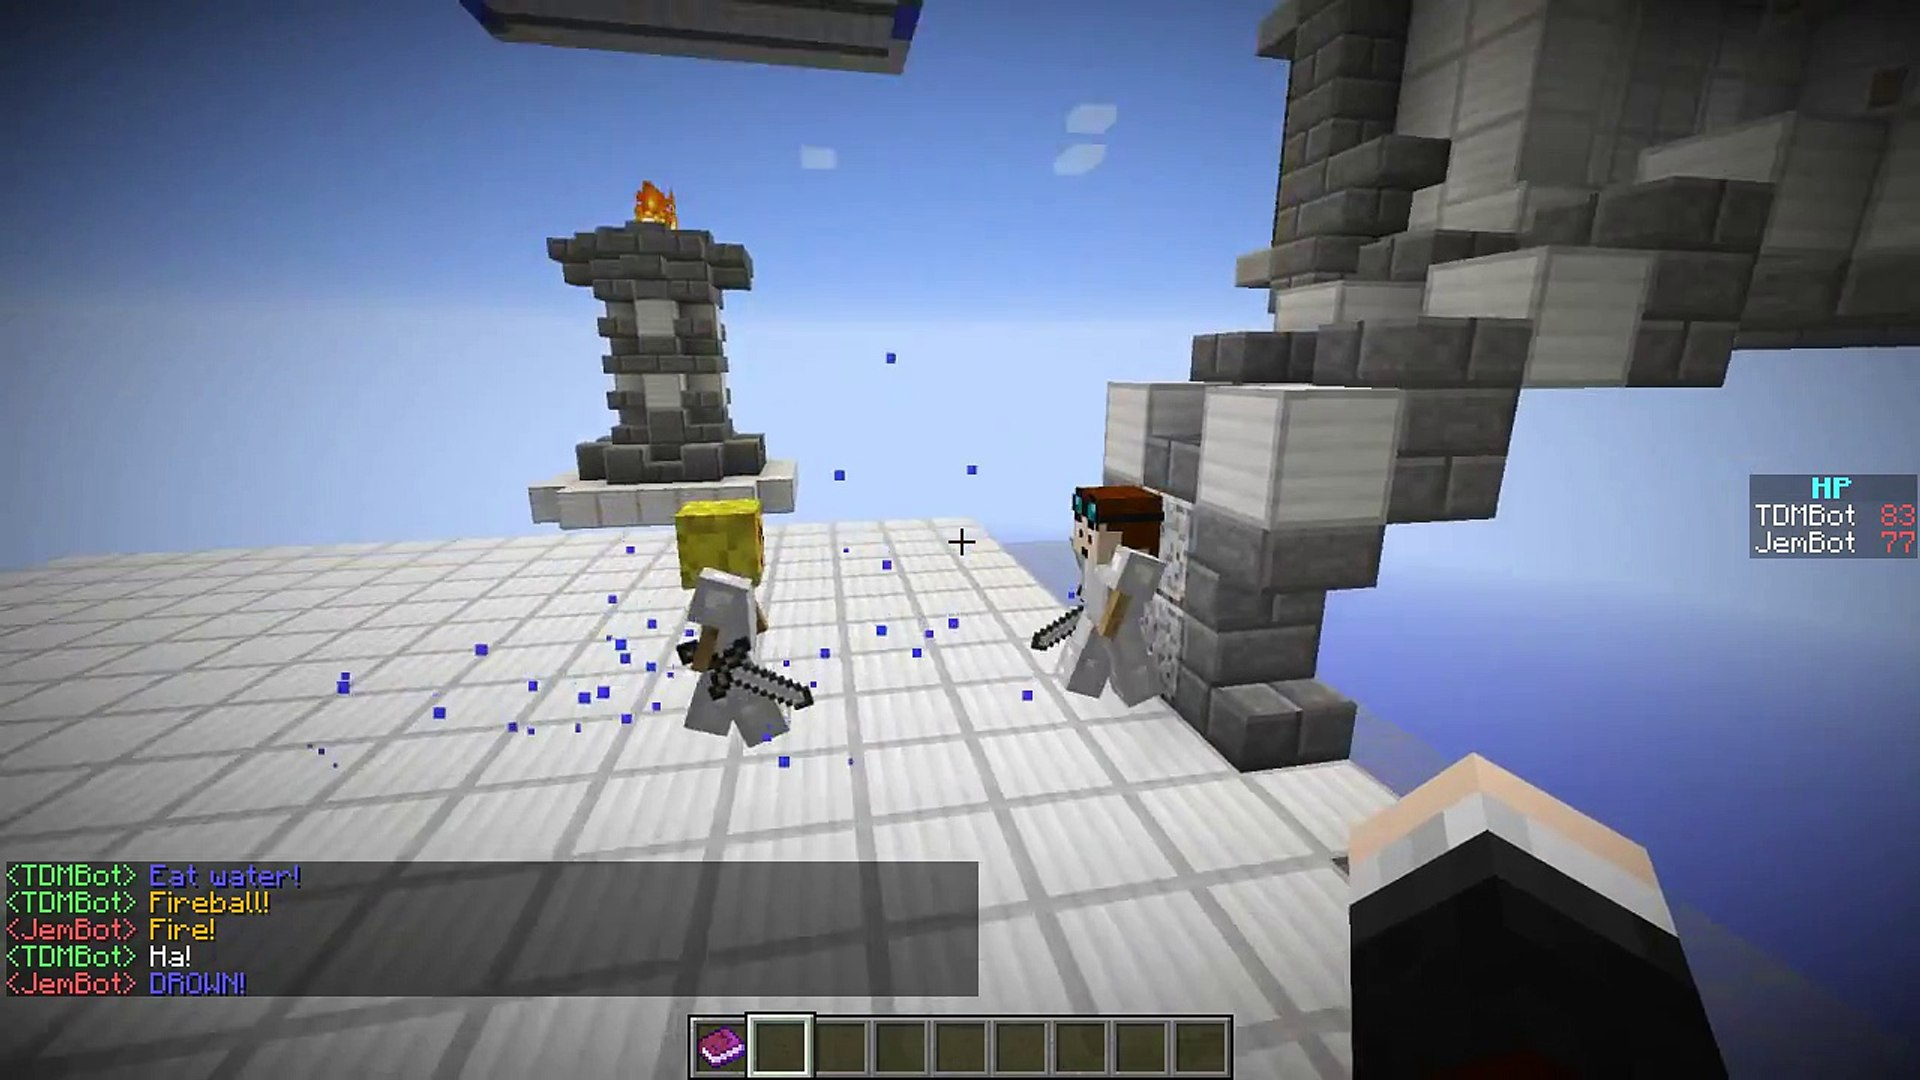 Minecraft - EPIC ROBOT BATTLE!! (DanTDM vs xXJemmaMXx) - Vanilla Mod  Showcase